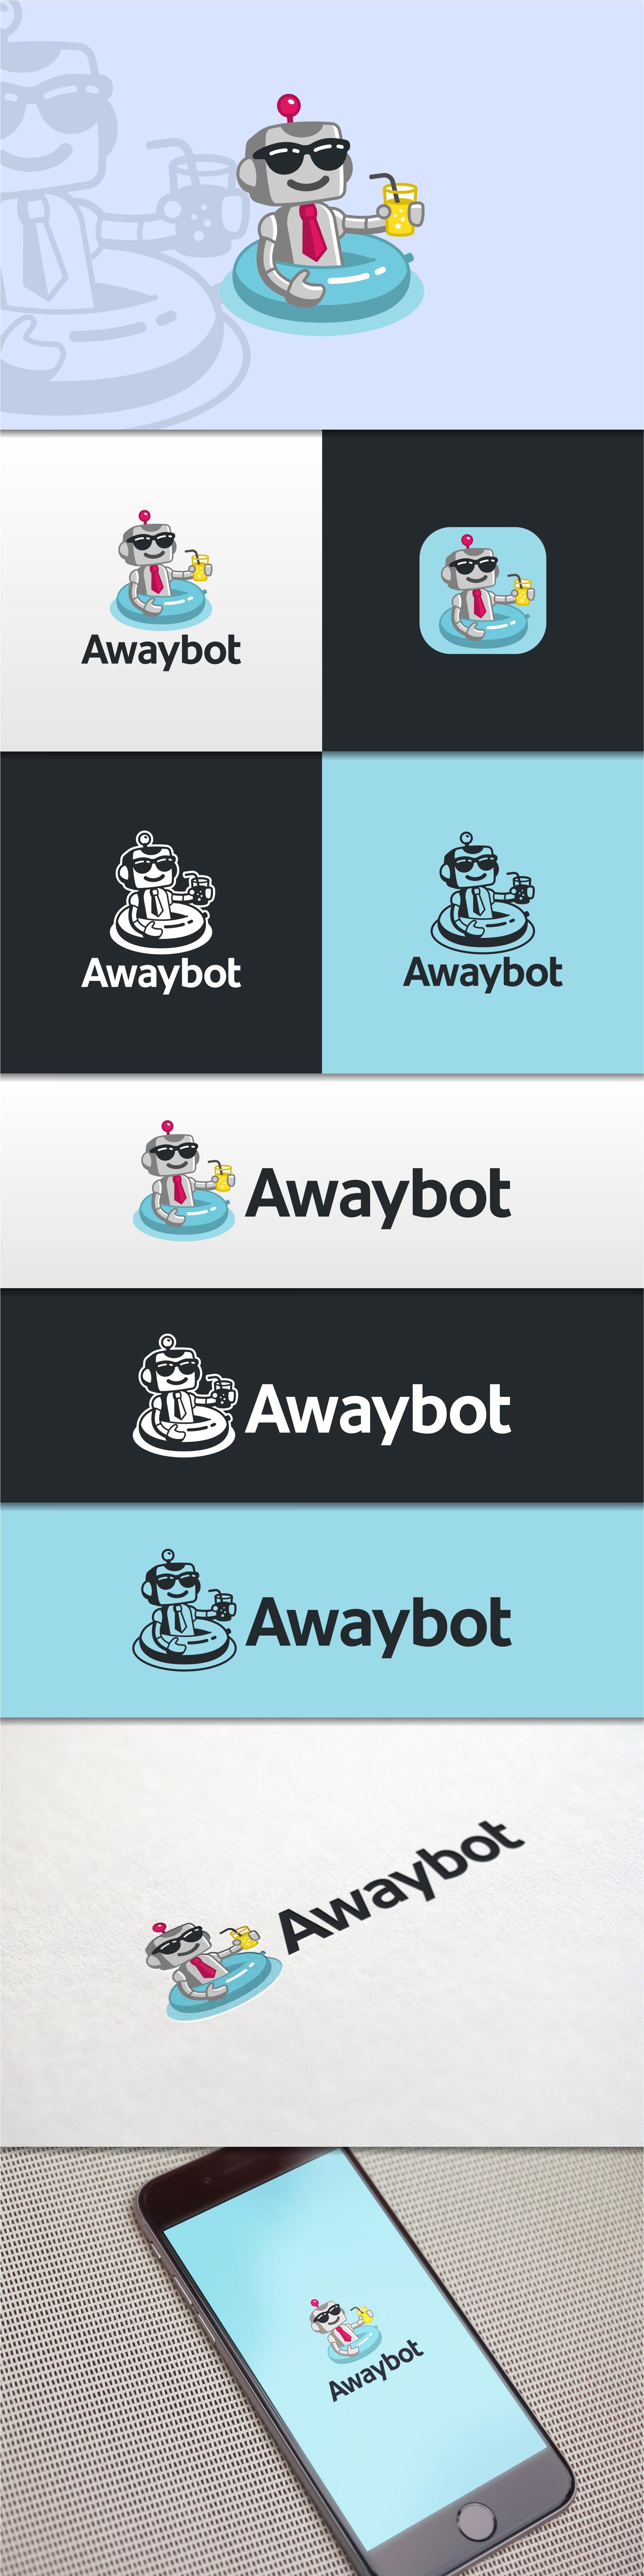 Awaybot